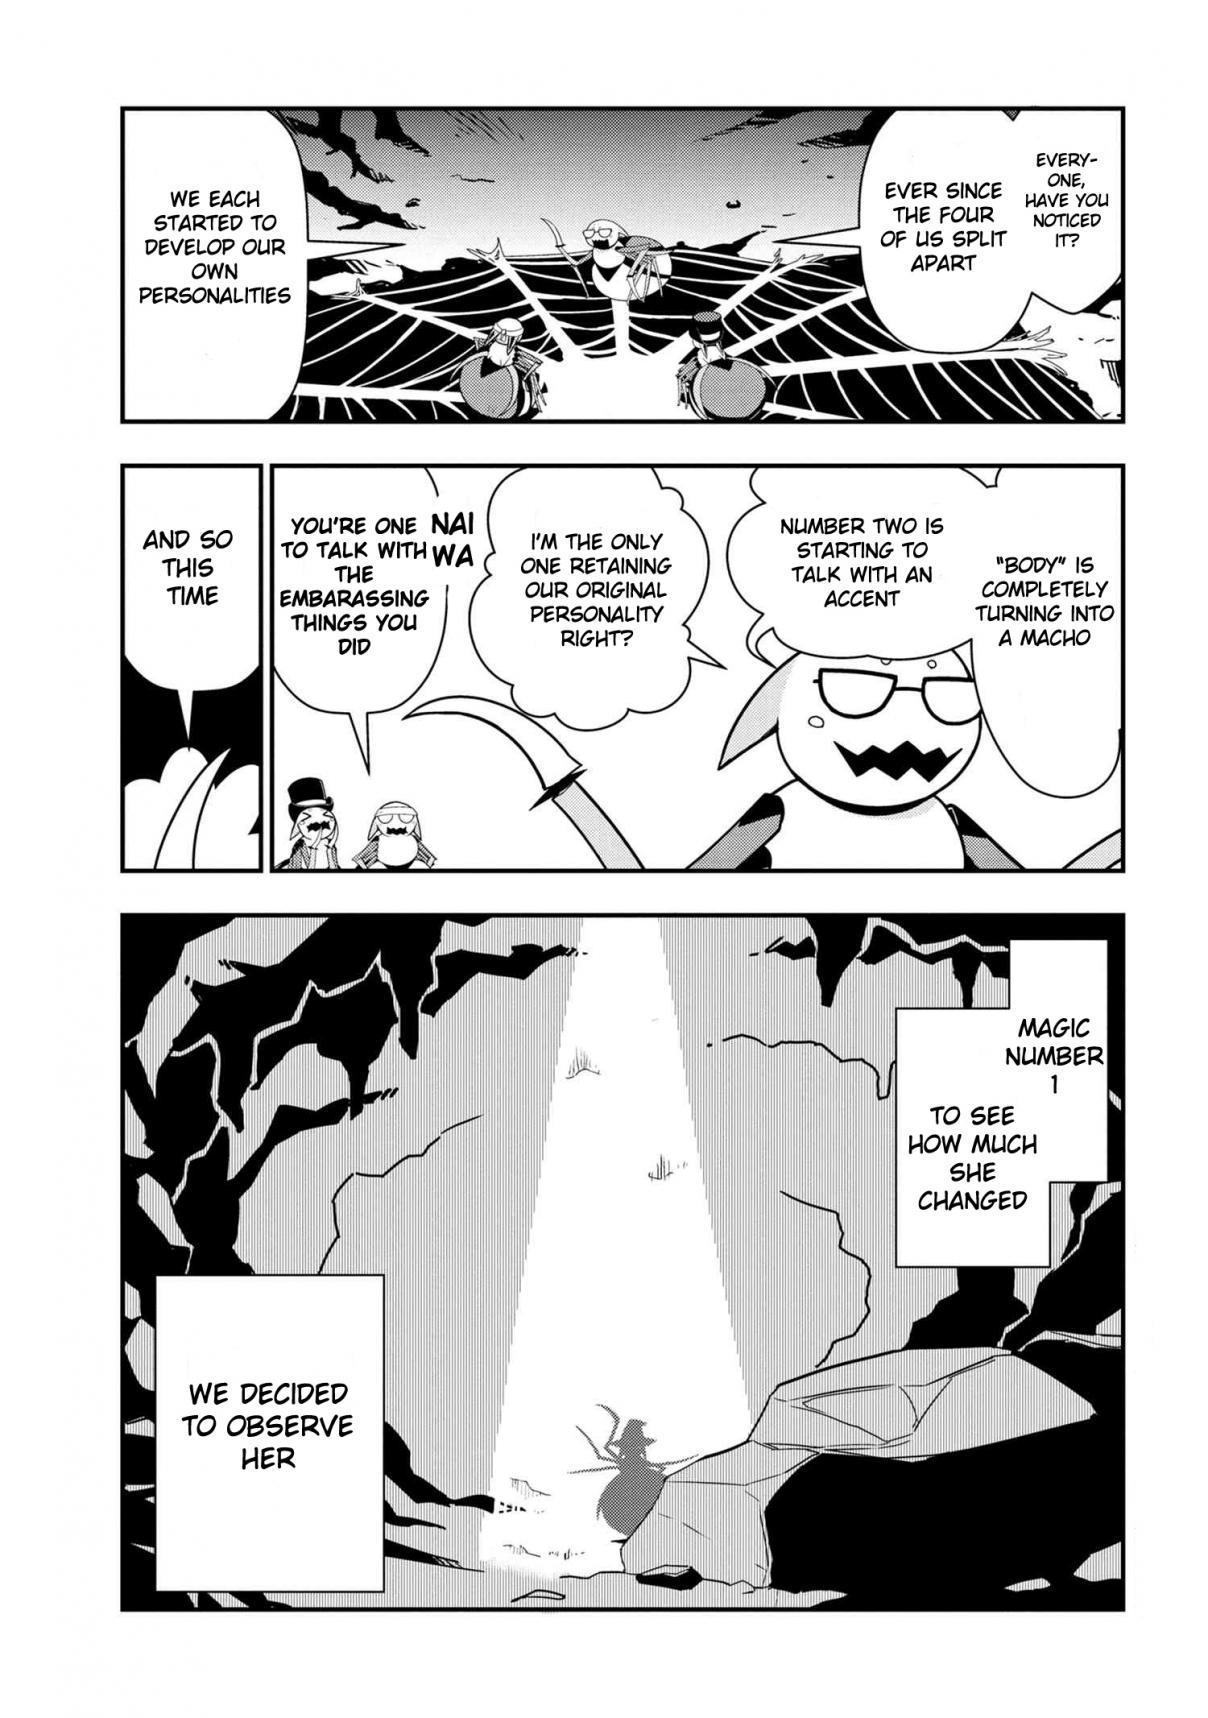 https://img2.nineanime.com/comics/pic2/49/29681/816297/aad23dd98dc4745d655517c0a7b73659.jpg Page 1